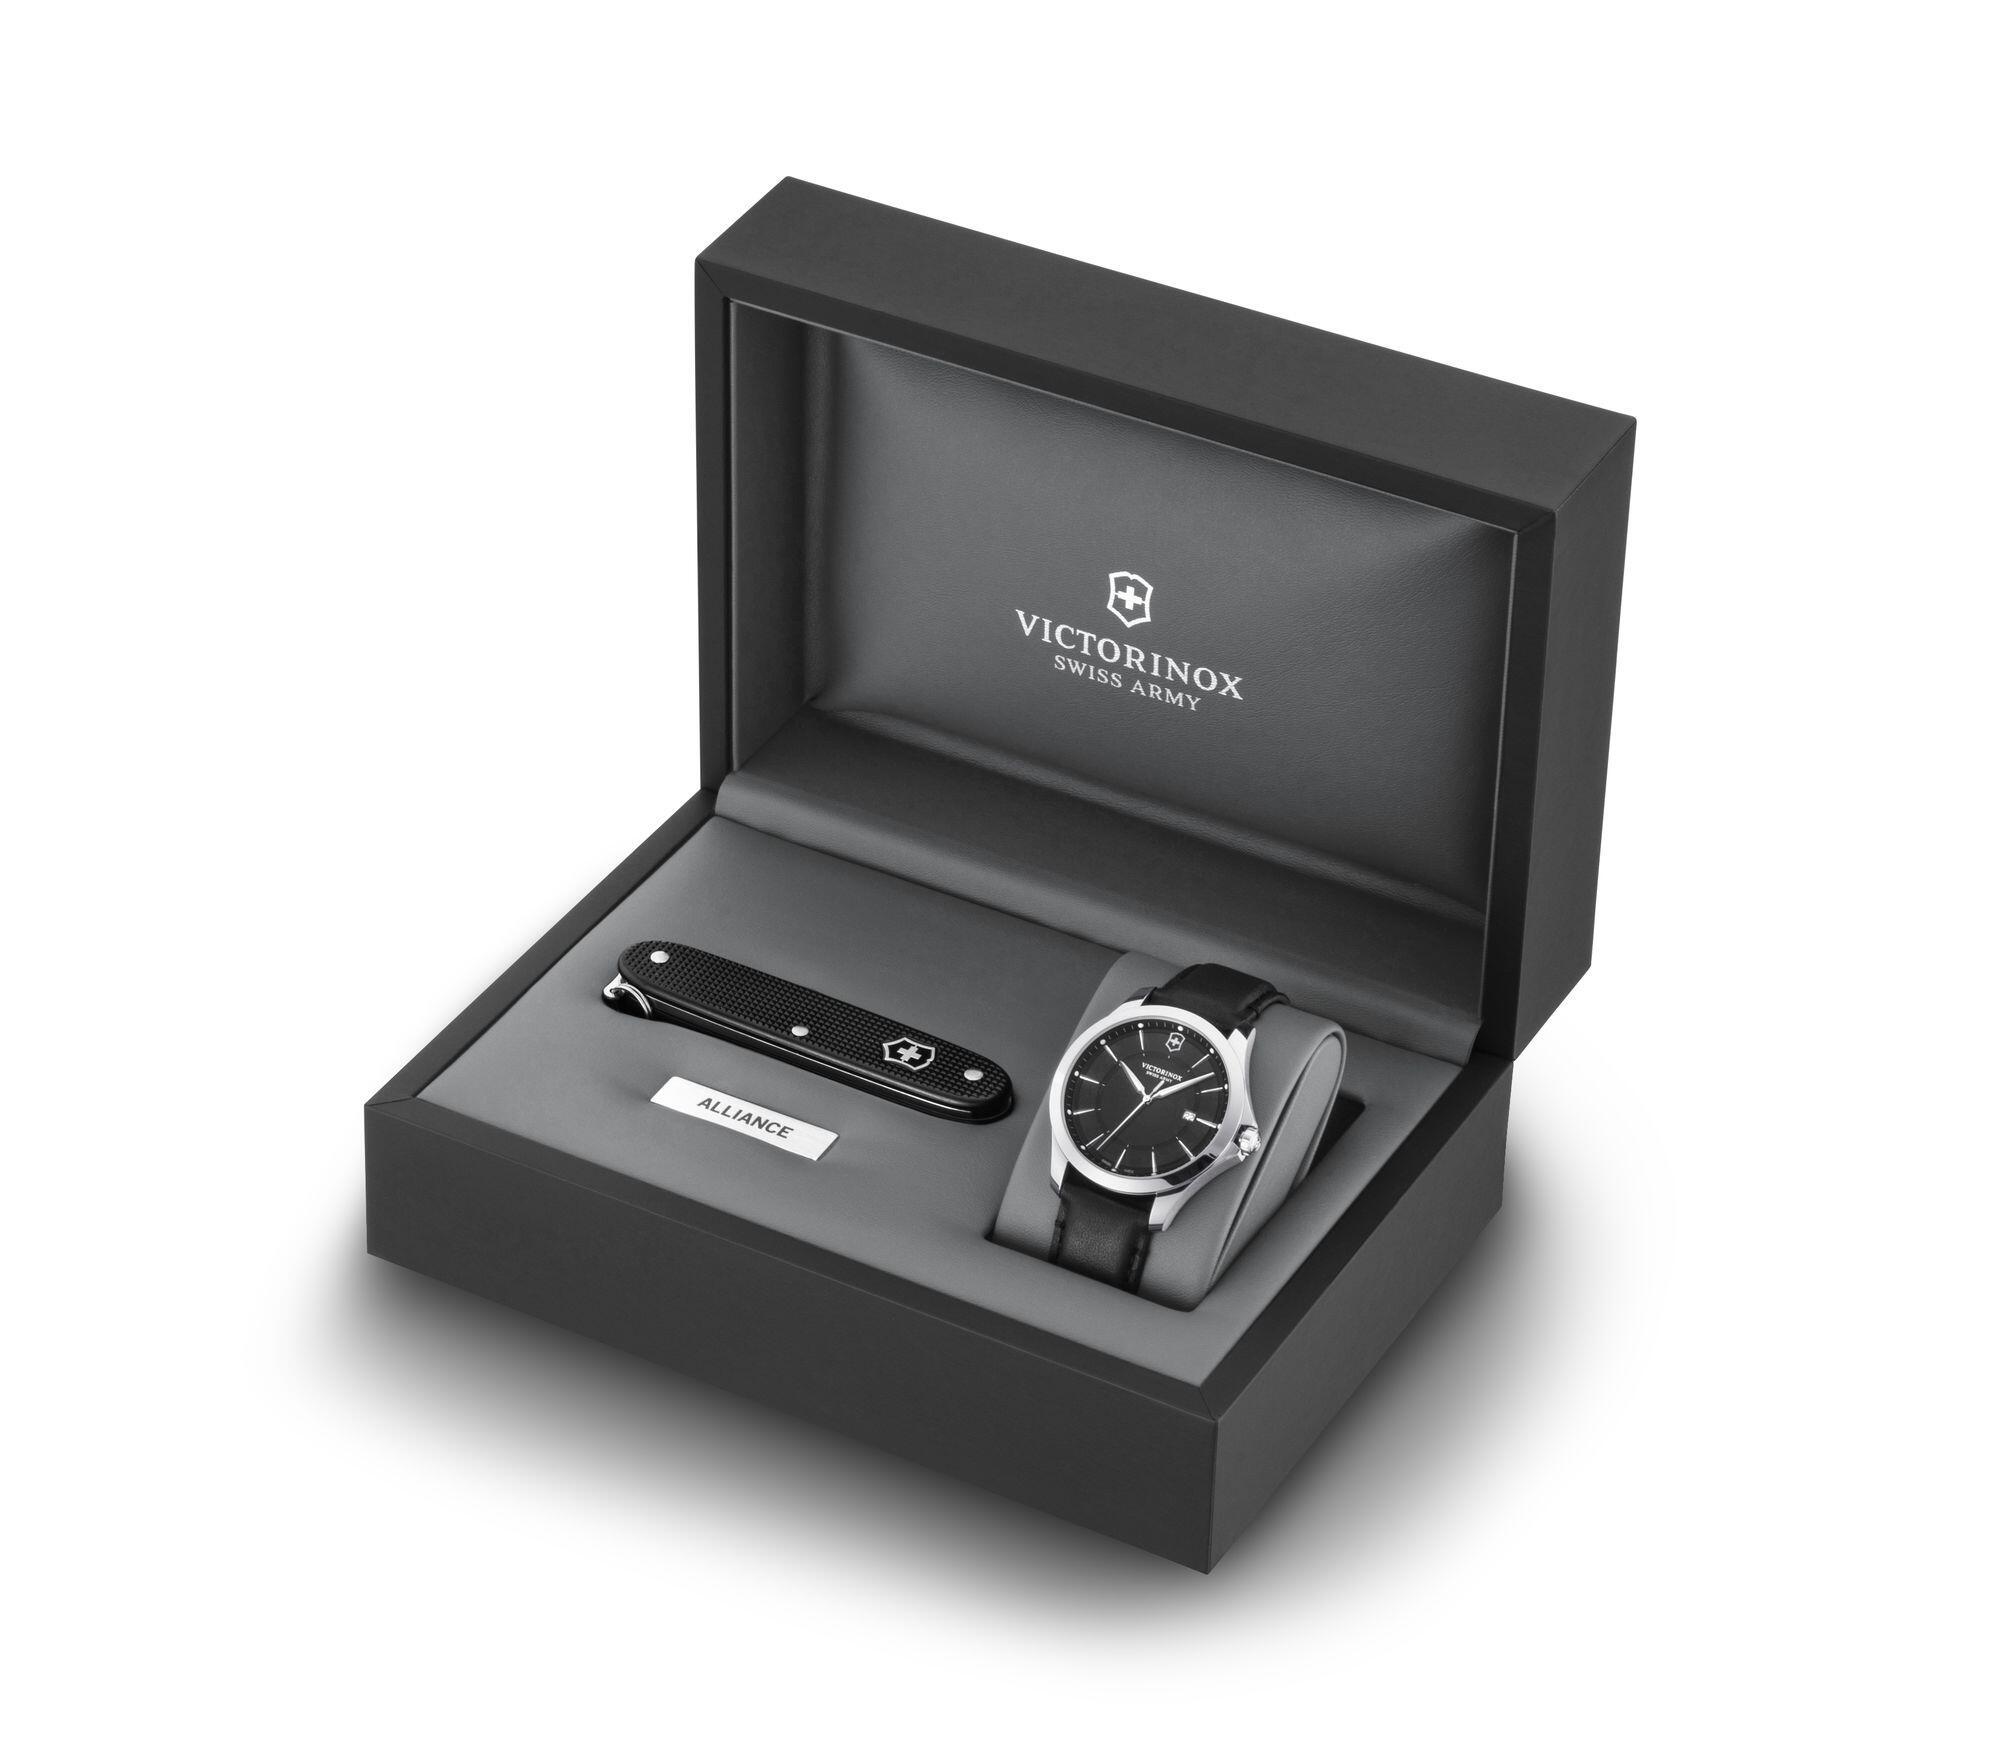 Kit Relógio Victorinox Masculino Preto + Canivete Suíço  - Alliance - 241904.1